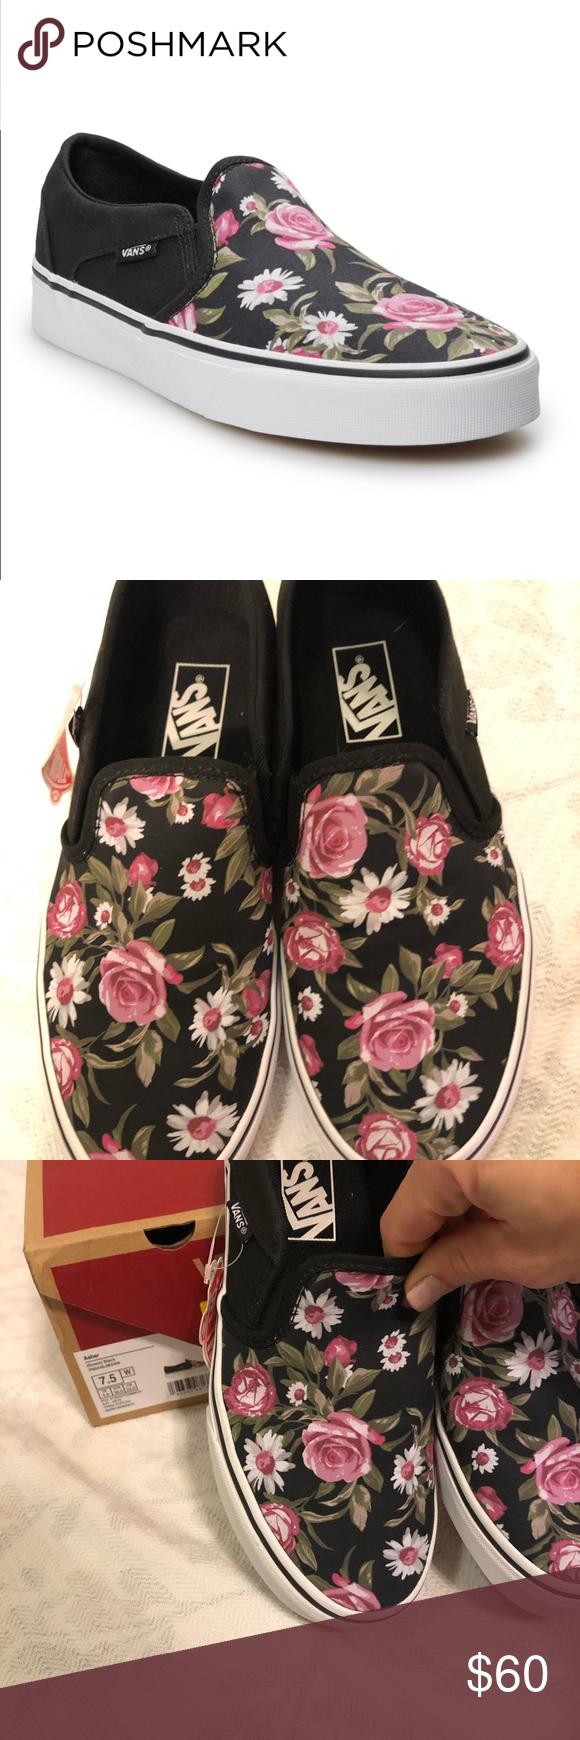 NIB Vans Asher Womens Floral Slate Shoe